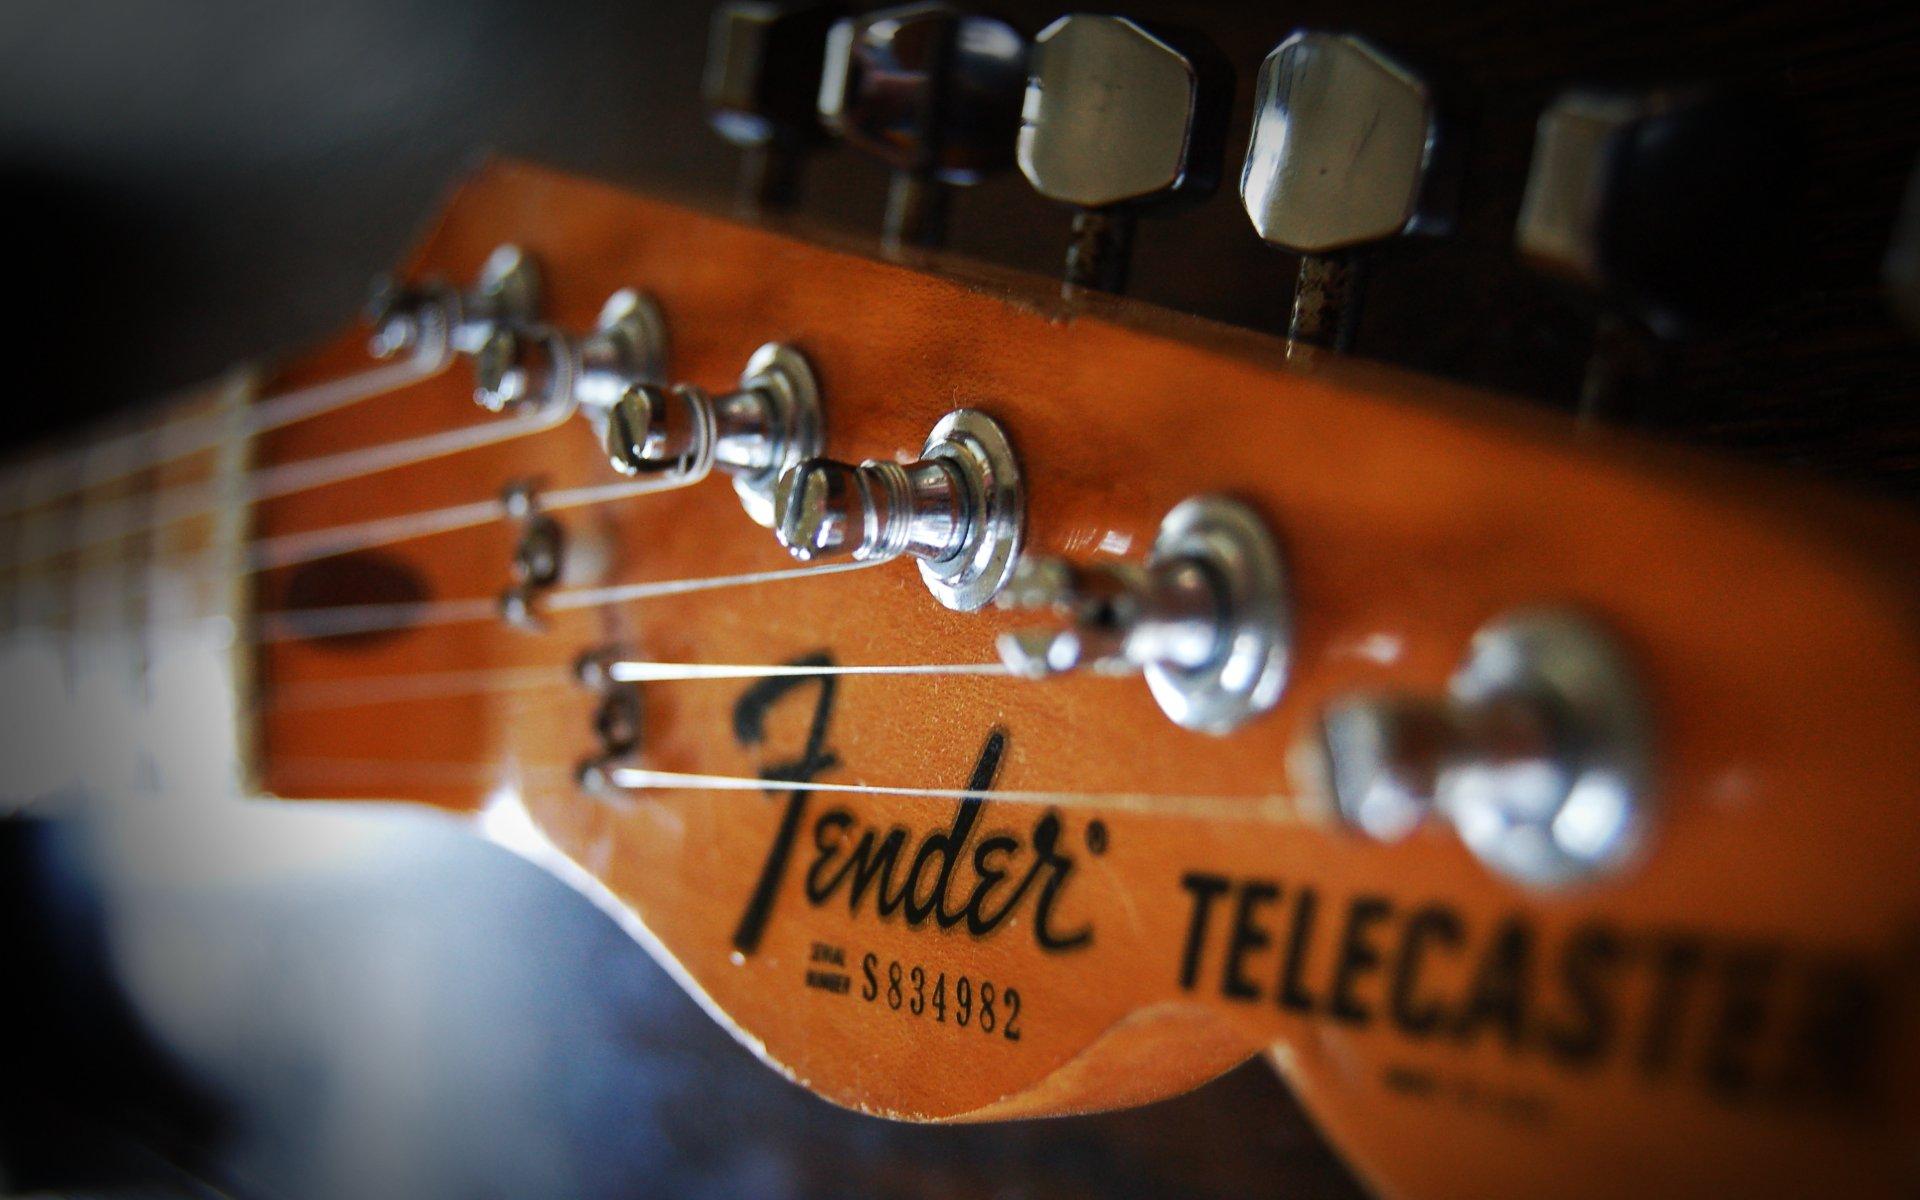 Fender Amp Iphone Wallpaper Guitar Fender Wallpaper 14118 Hd 1920x1200